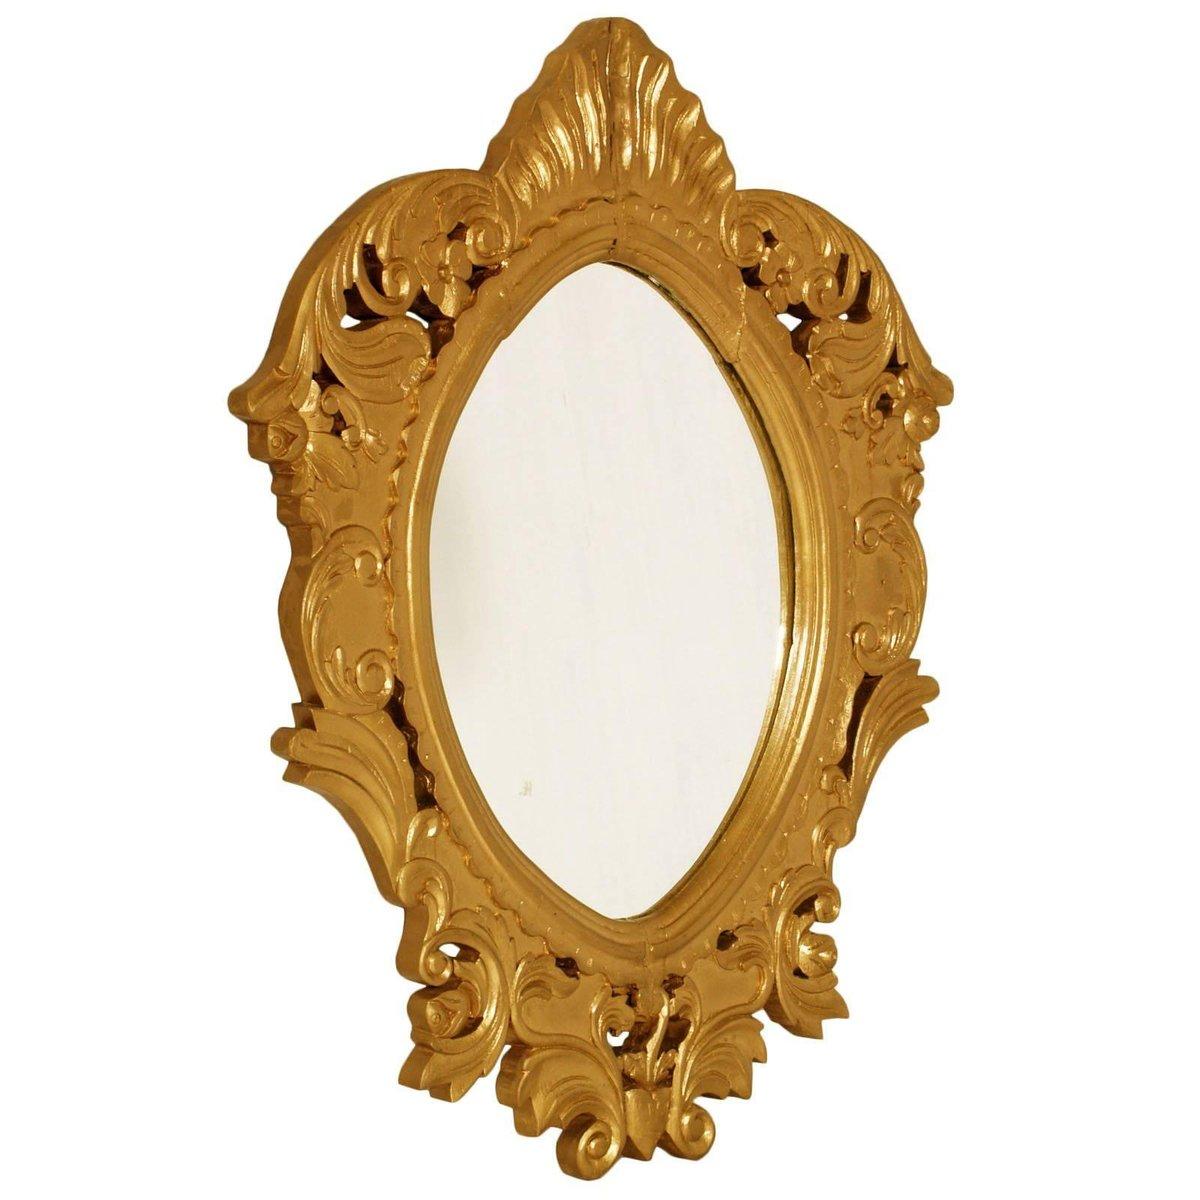 miroir baroque en bois dor 1700s en vente sur pamono